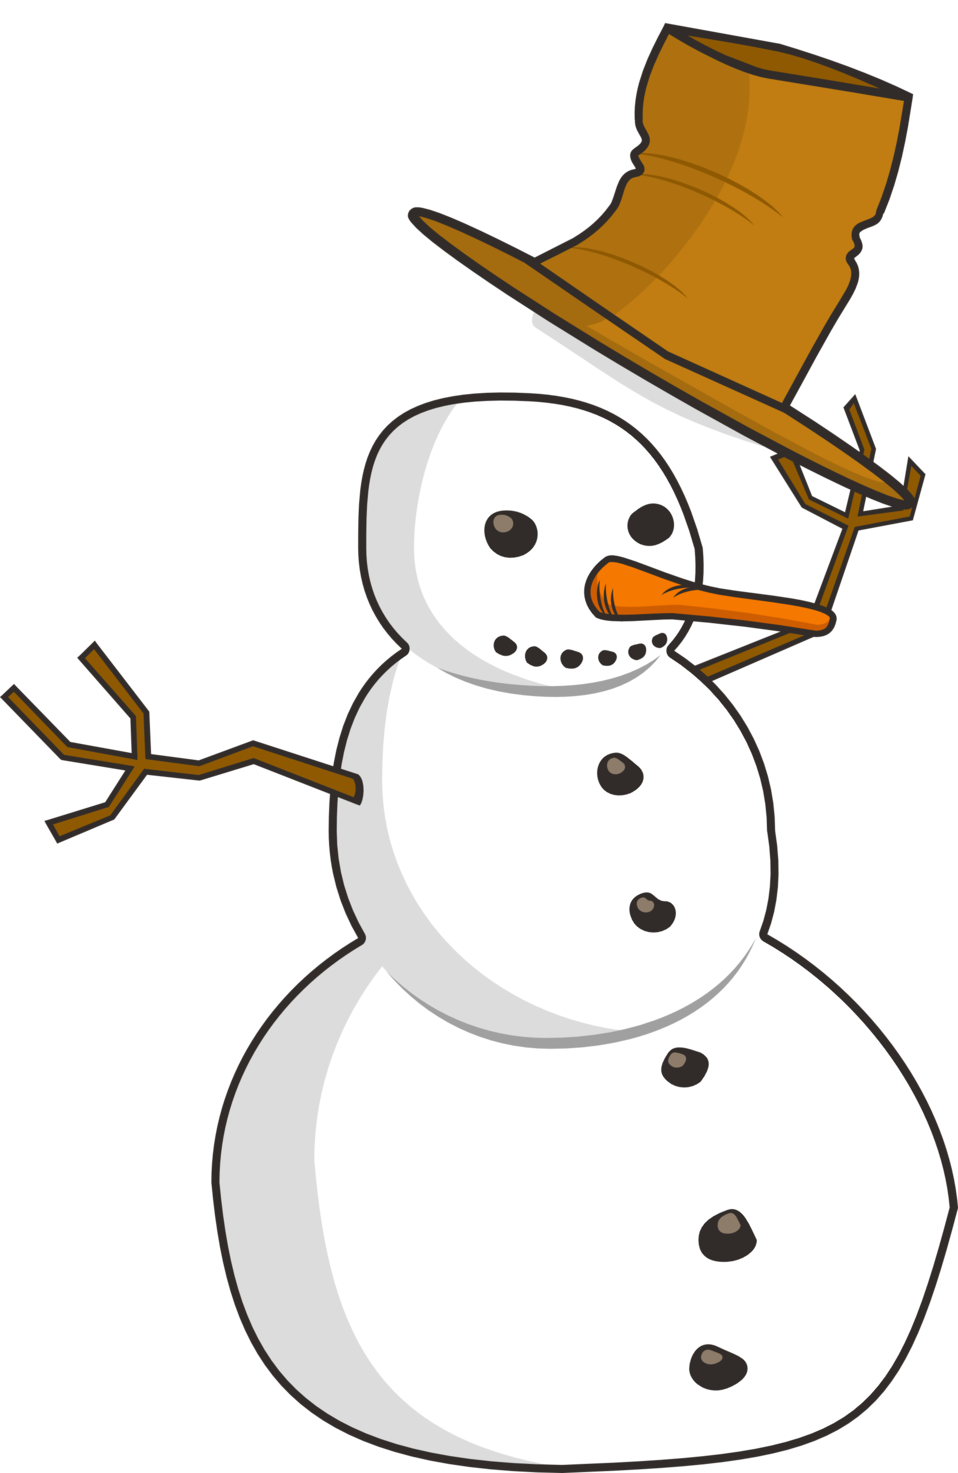 Snowman book clipart svg free stock Public Domain Clip Art Image | Hat Tip Snowman | ID: 13529485212529 ... svg free stock